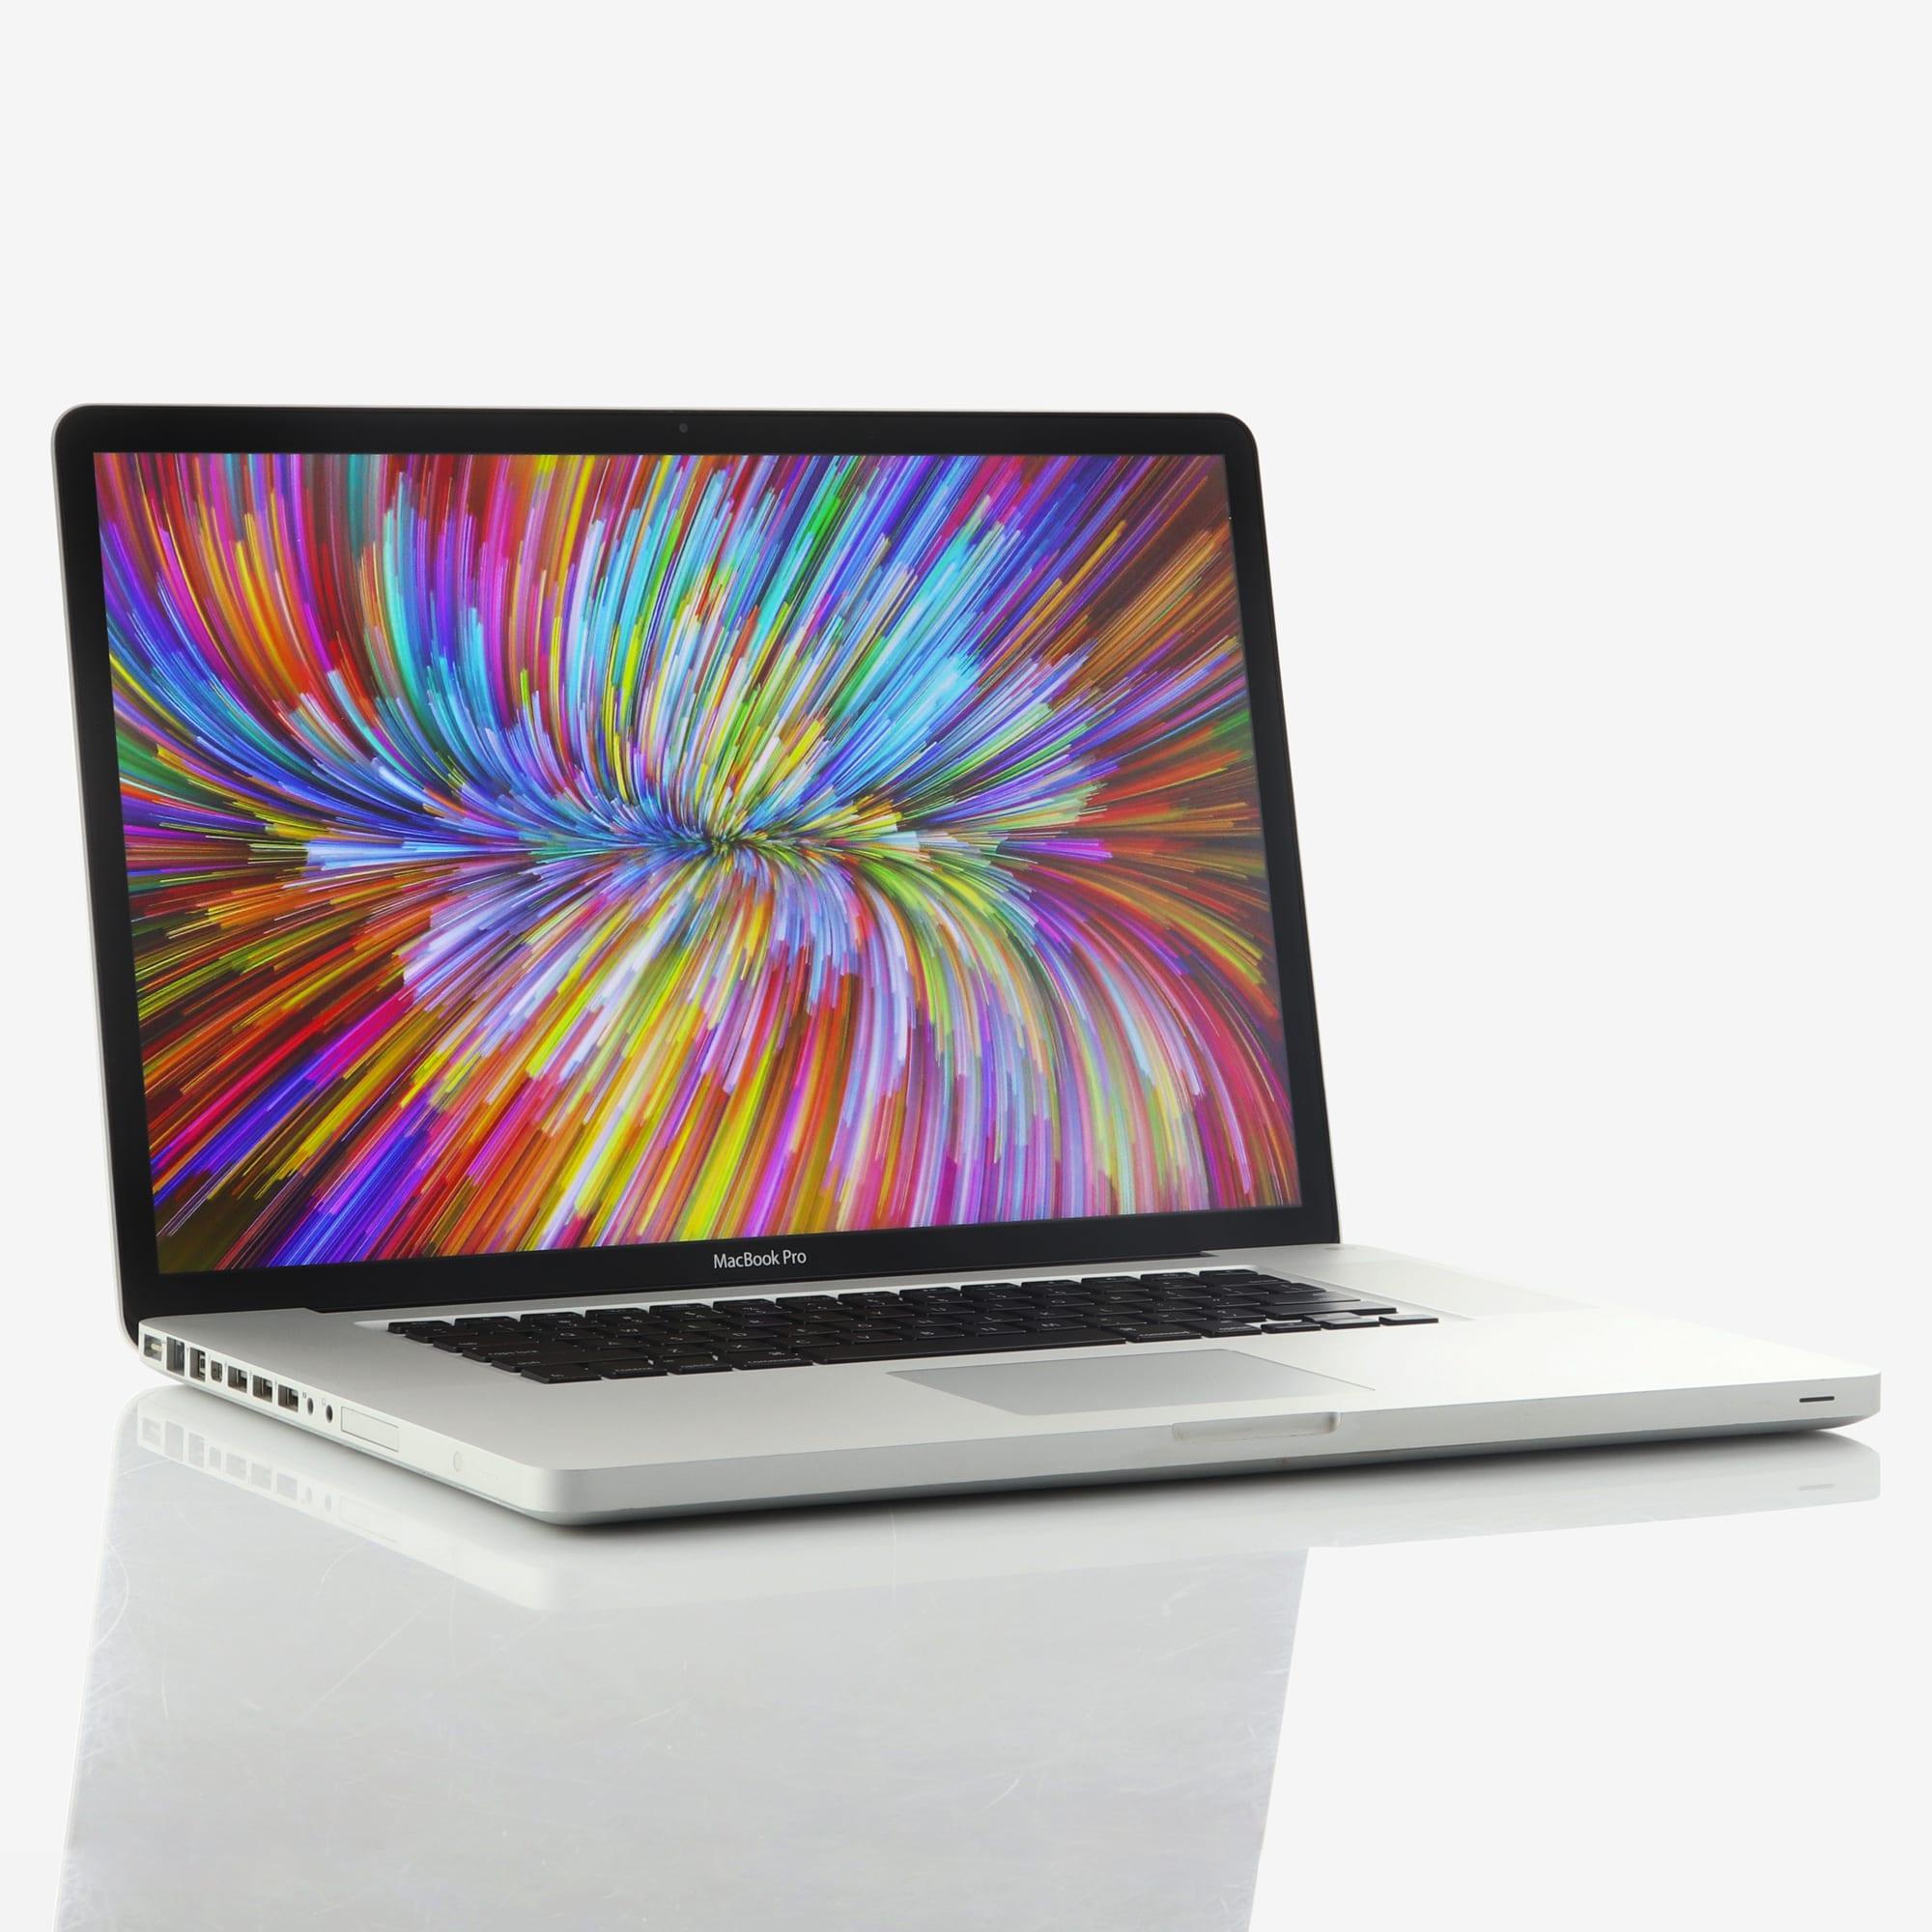 1 x MacBook Pro 17 Inch